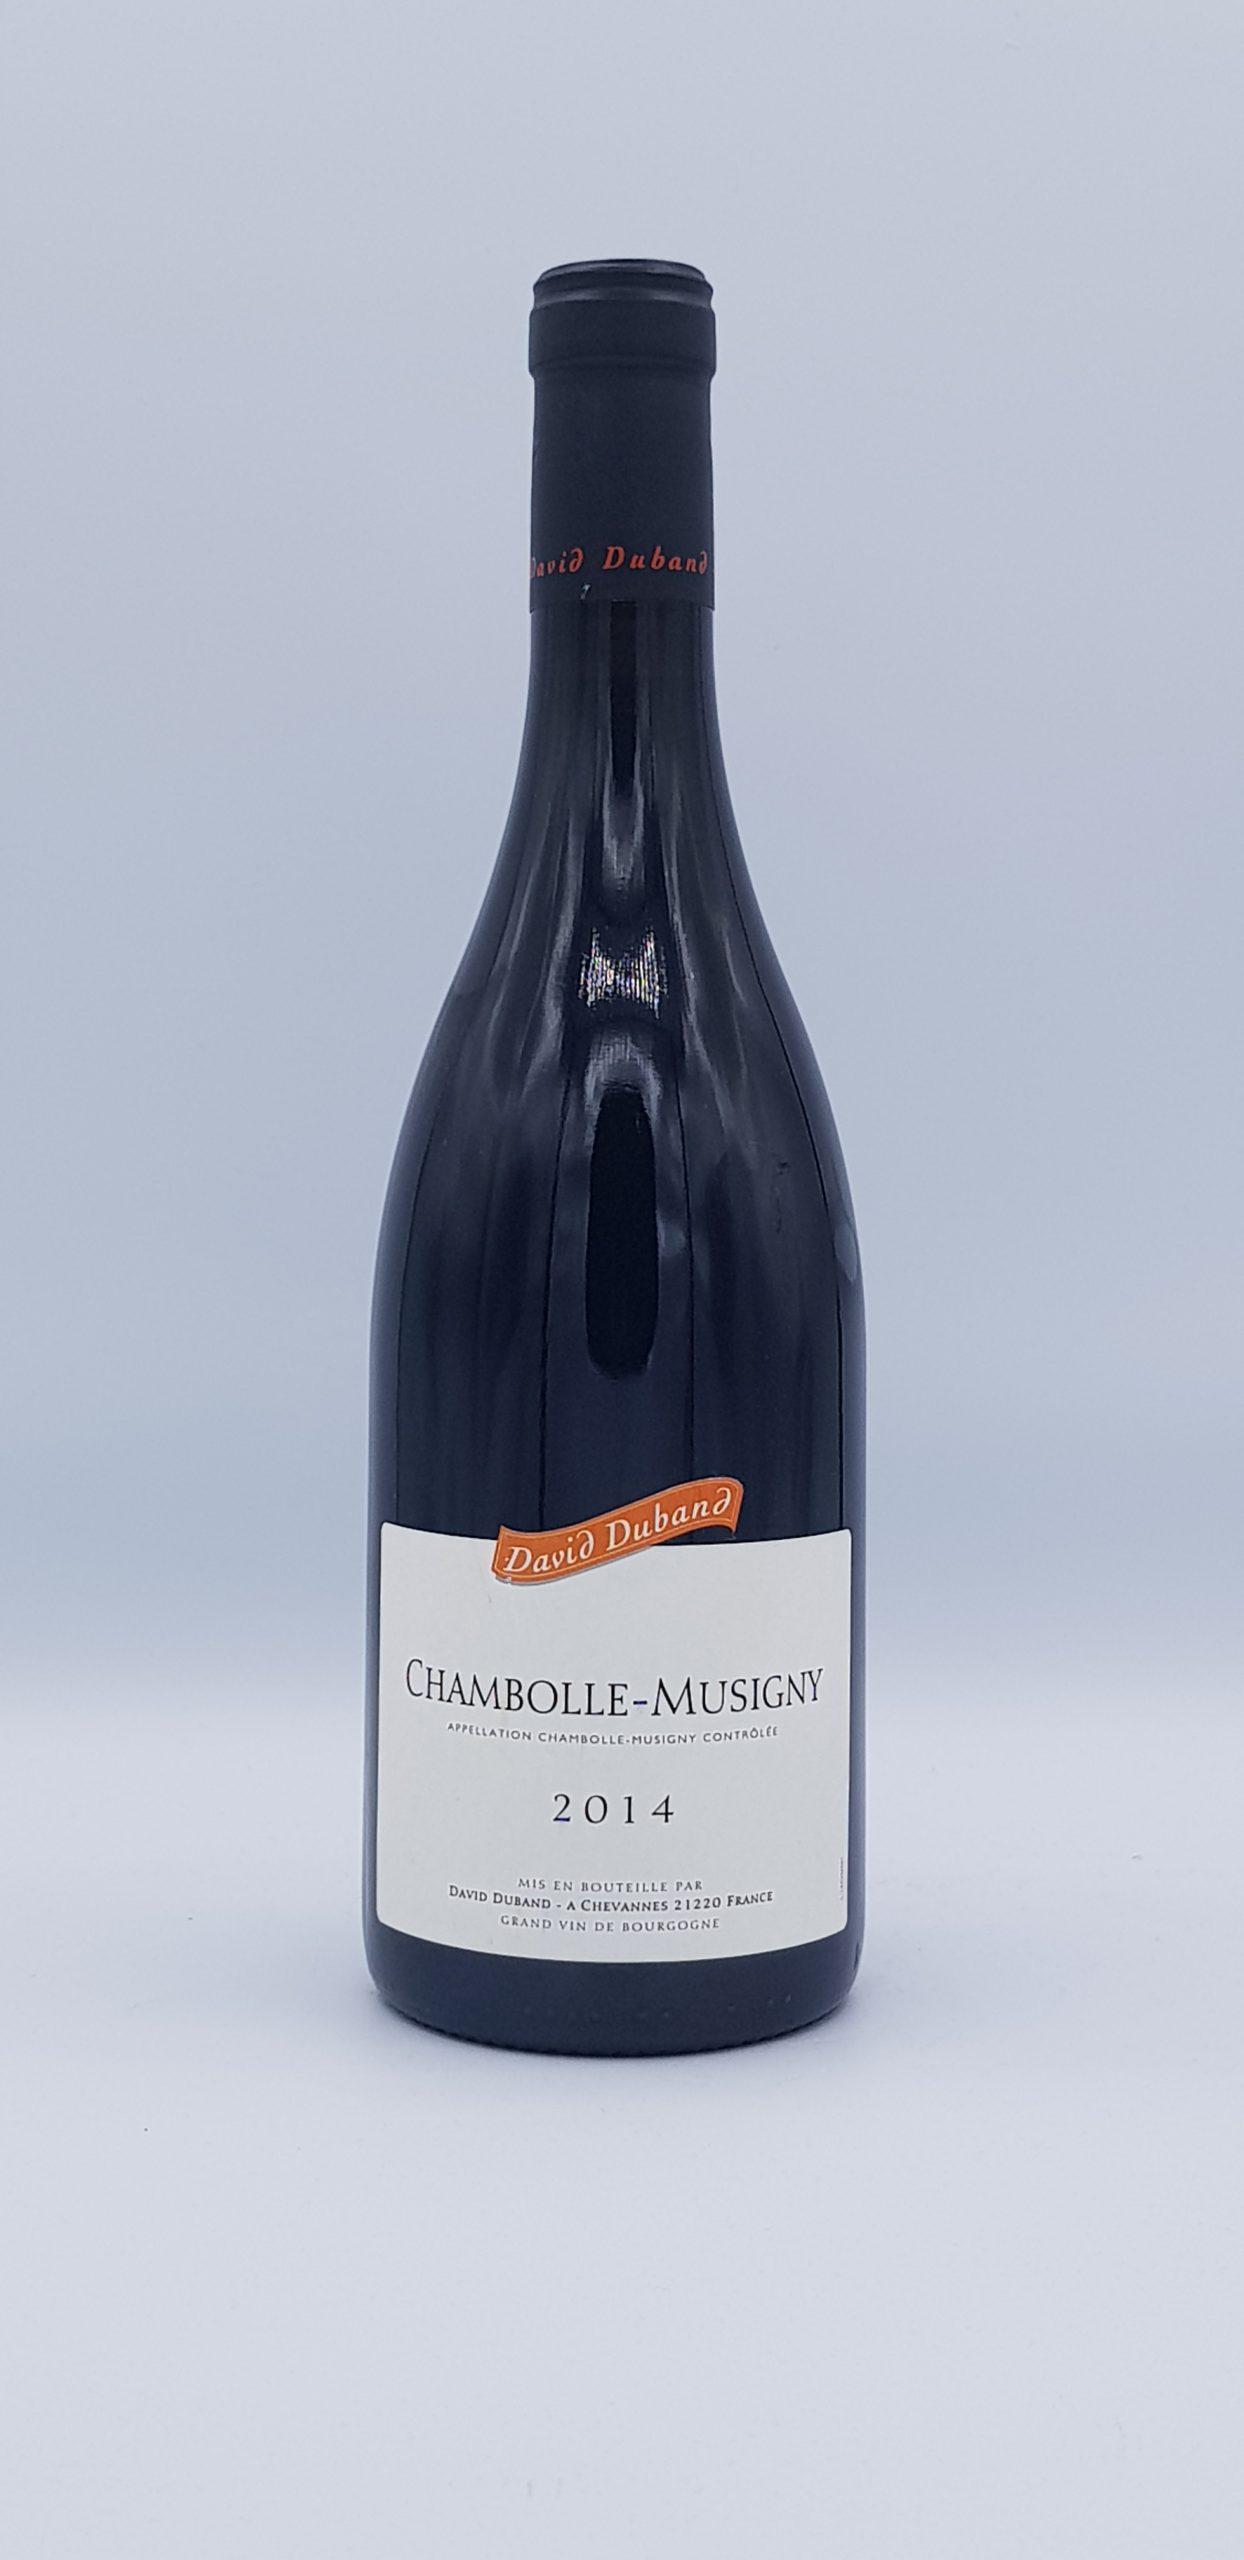 Chambolle Musigny 2014